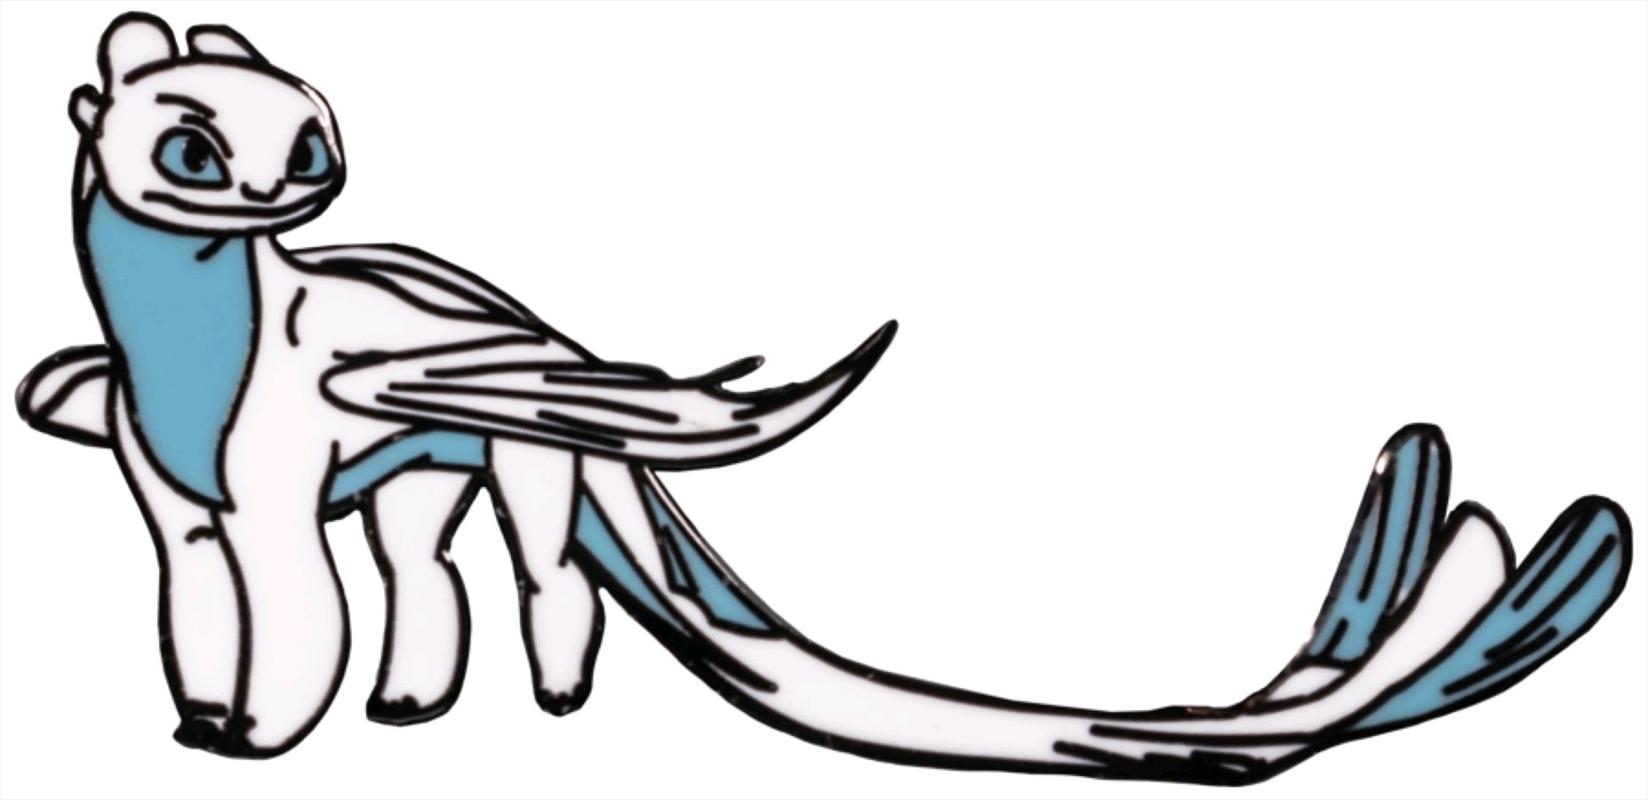 How to Train your Dragon - Lightfury Enamel Pin | Merchandise